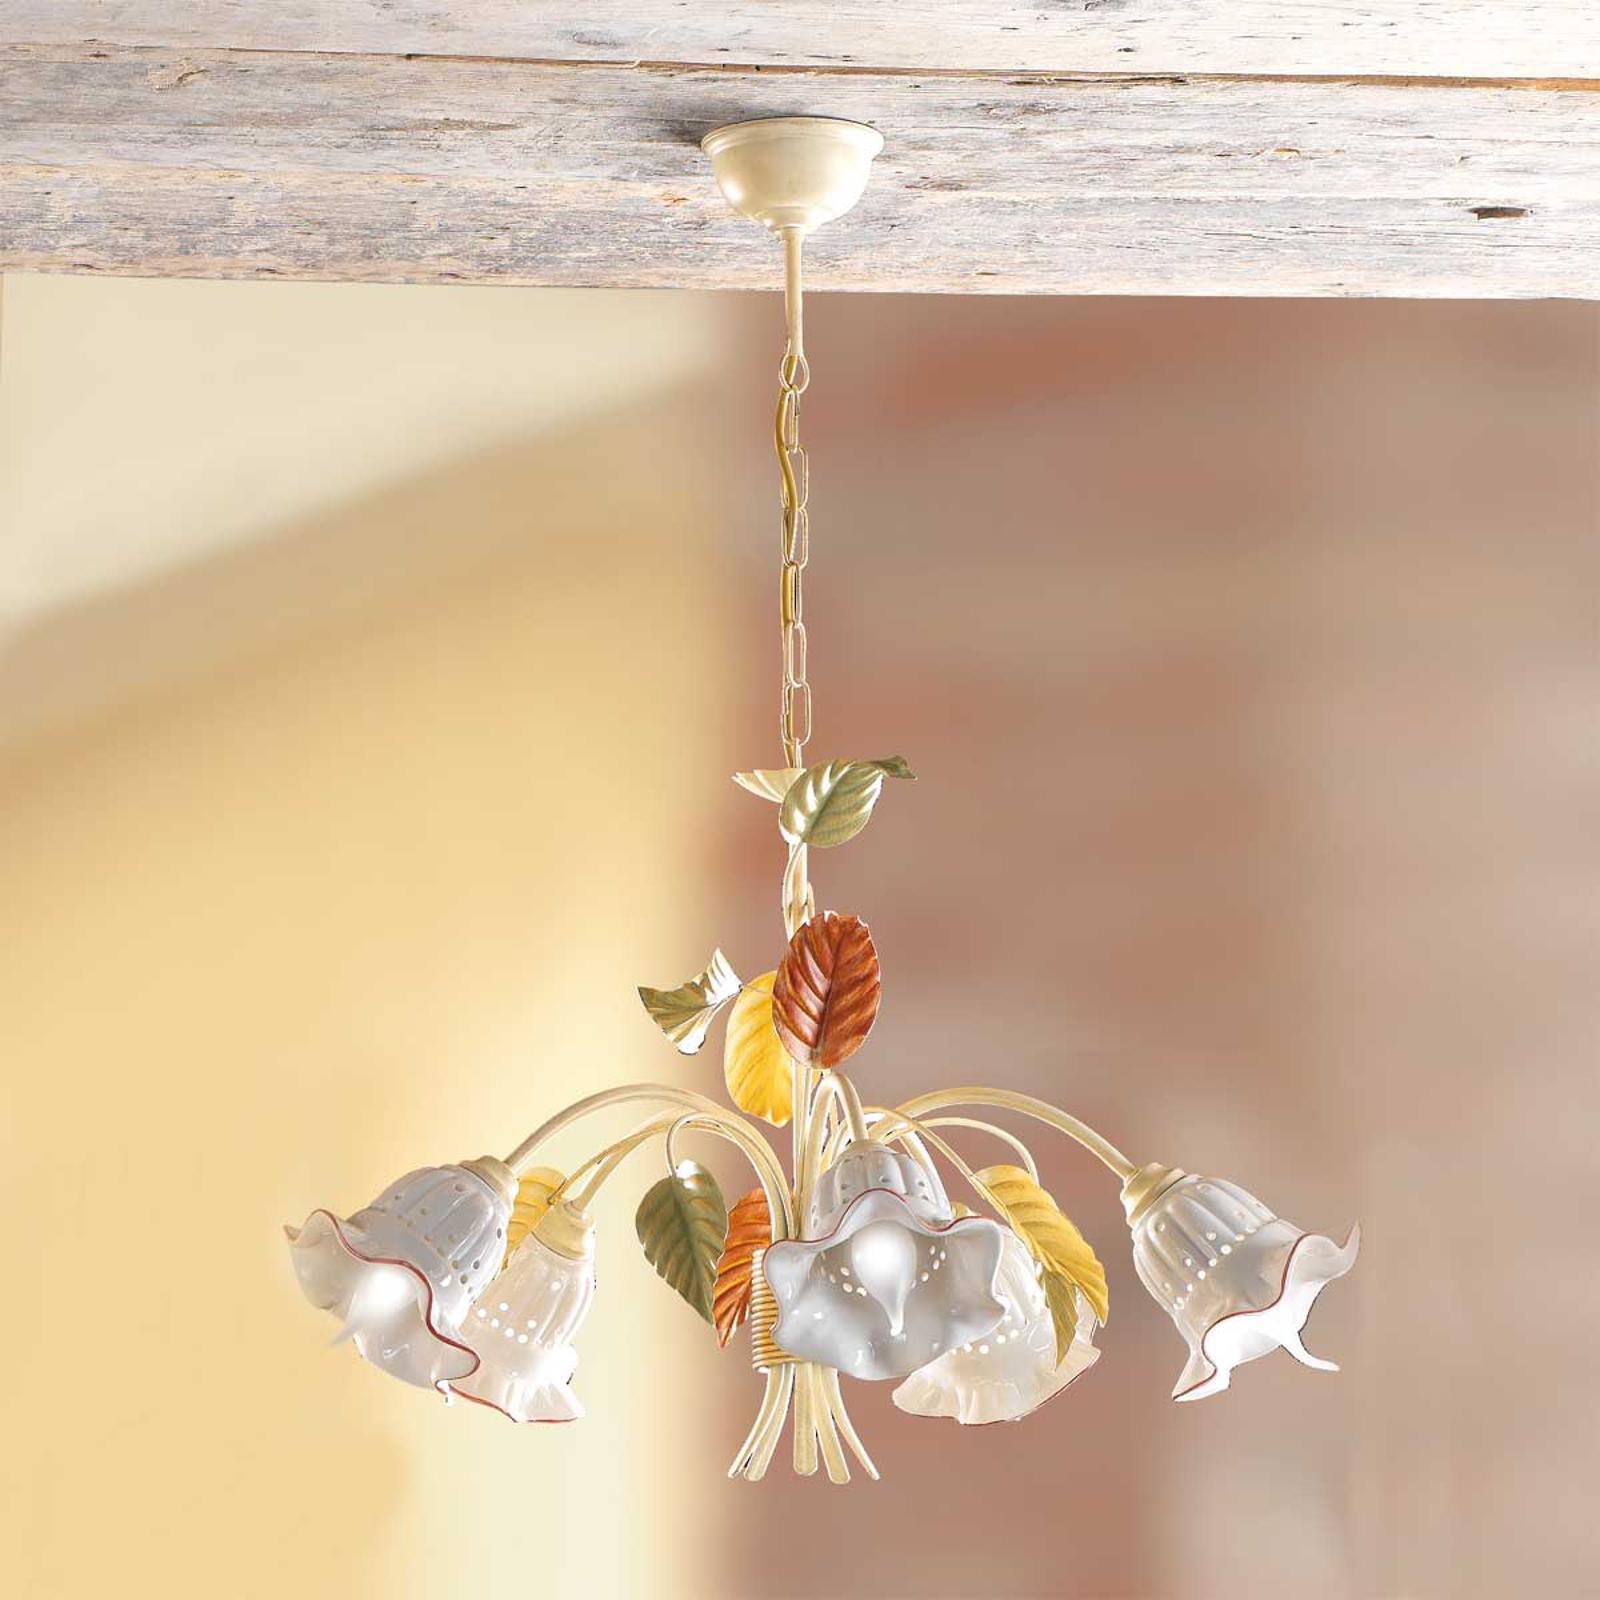 Lampada Flora in stile fiorentino, 5 punti luce